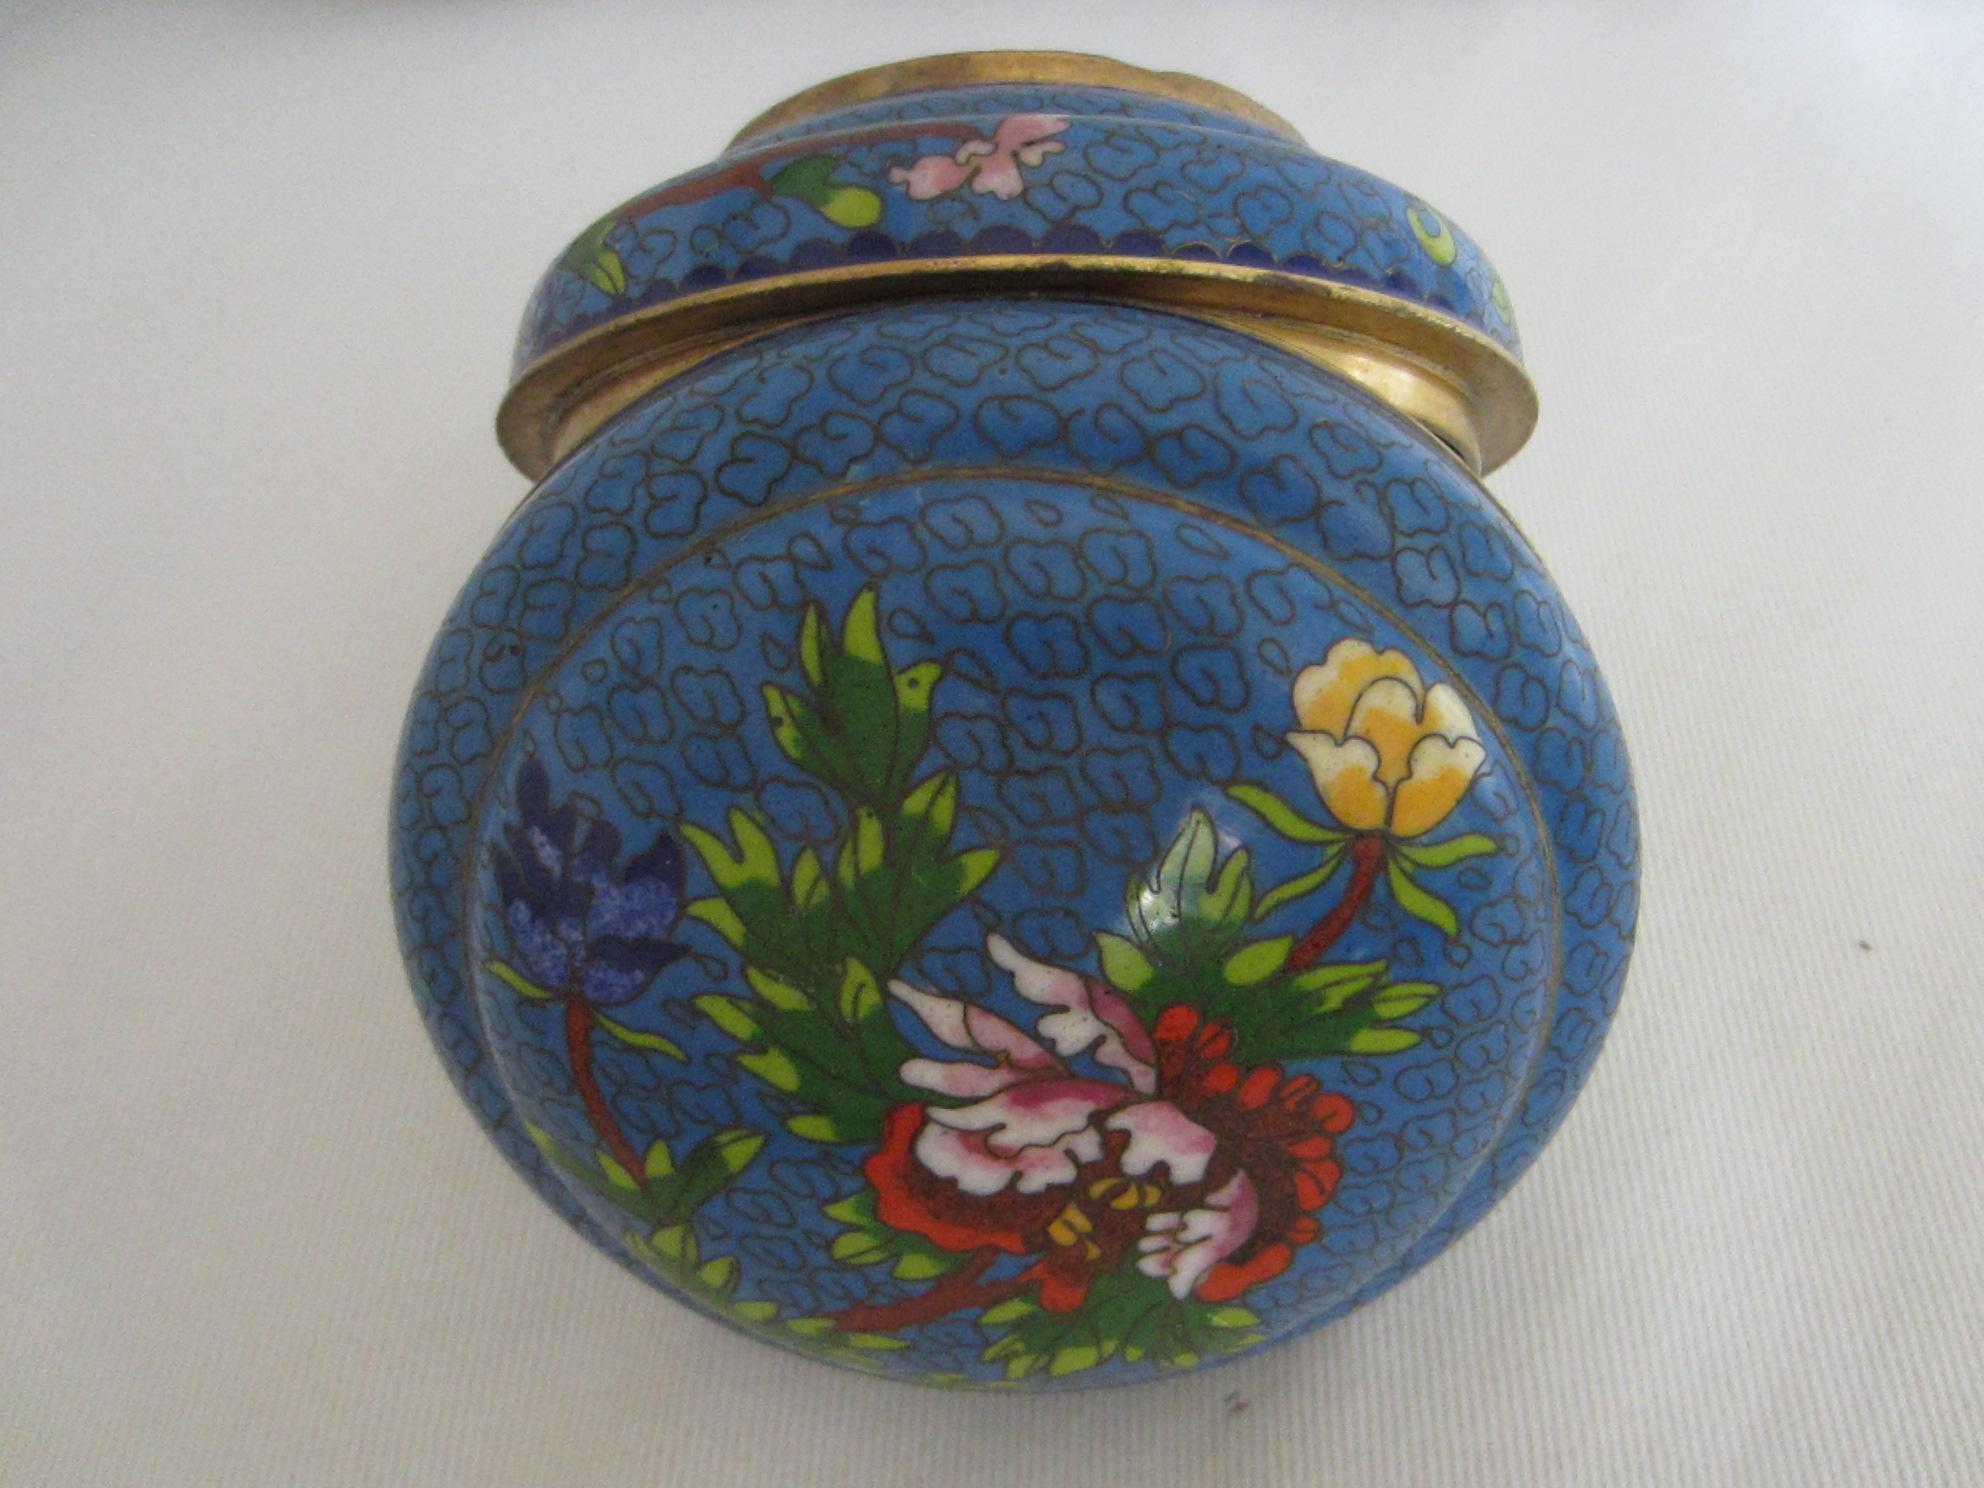 asian blue cloisonne round covered box for sale antiques. Black Bedroom Furniture Sets. Home Design Ideas